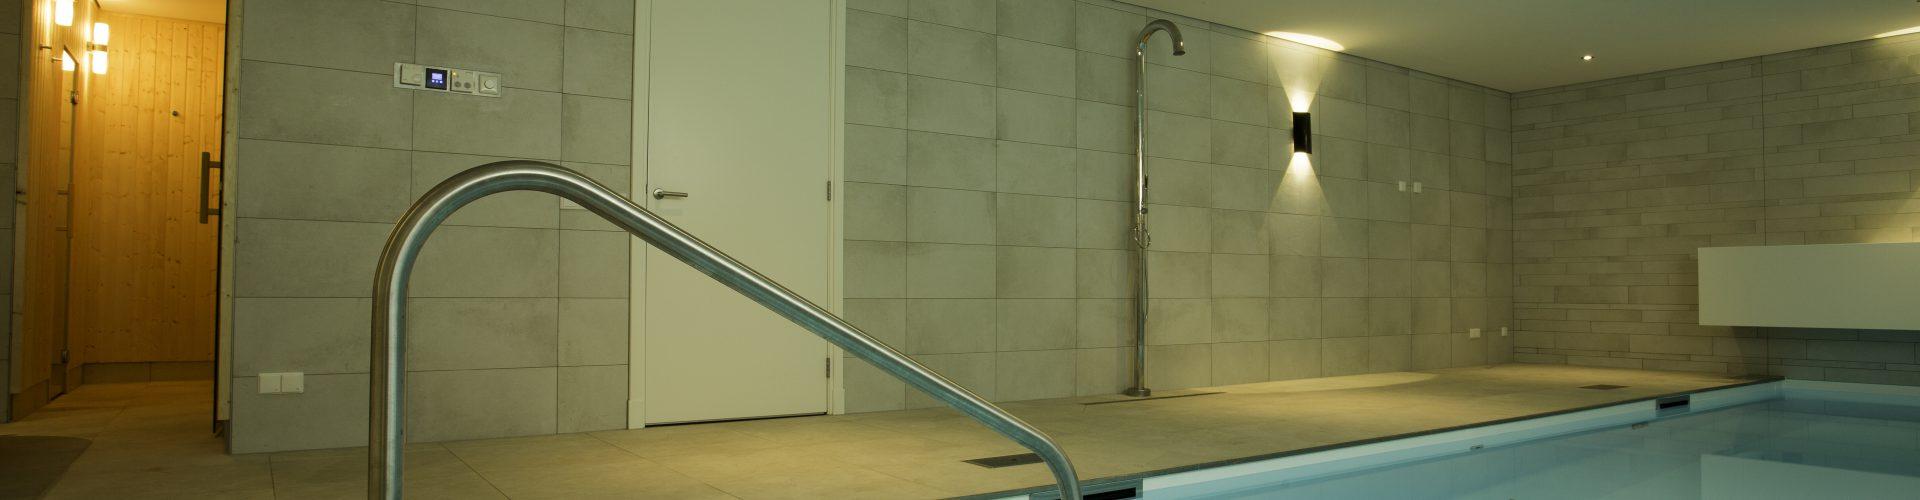 Binnenzwembad Bos